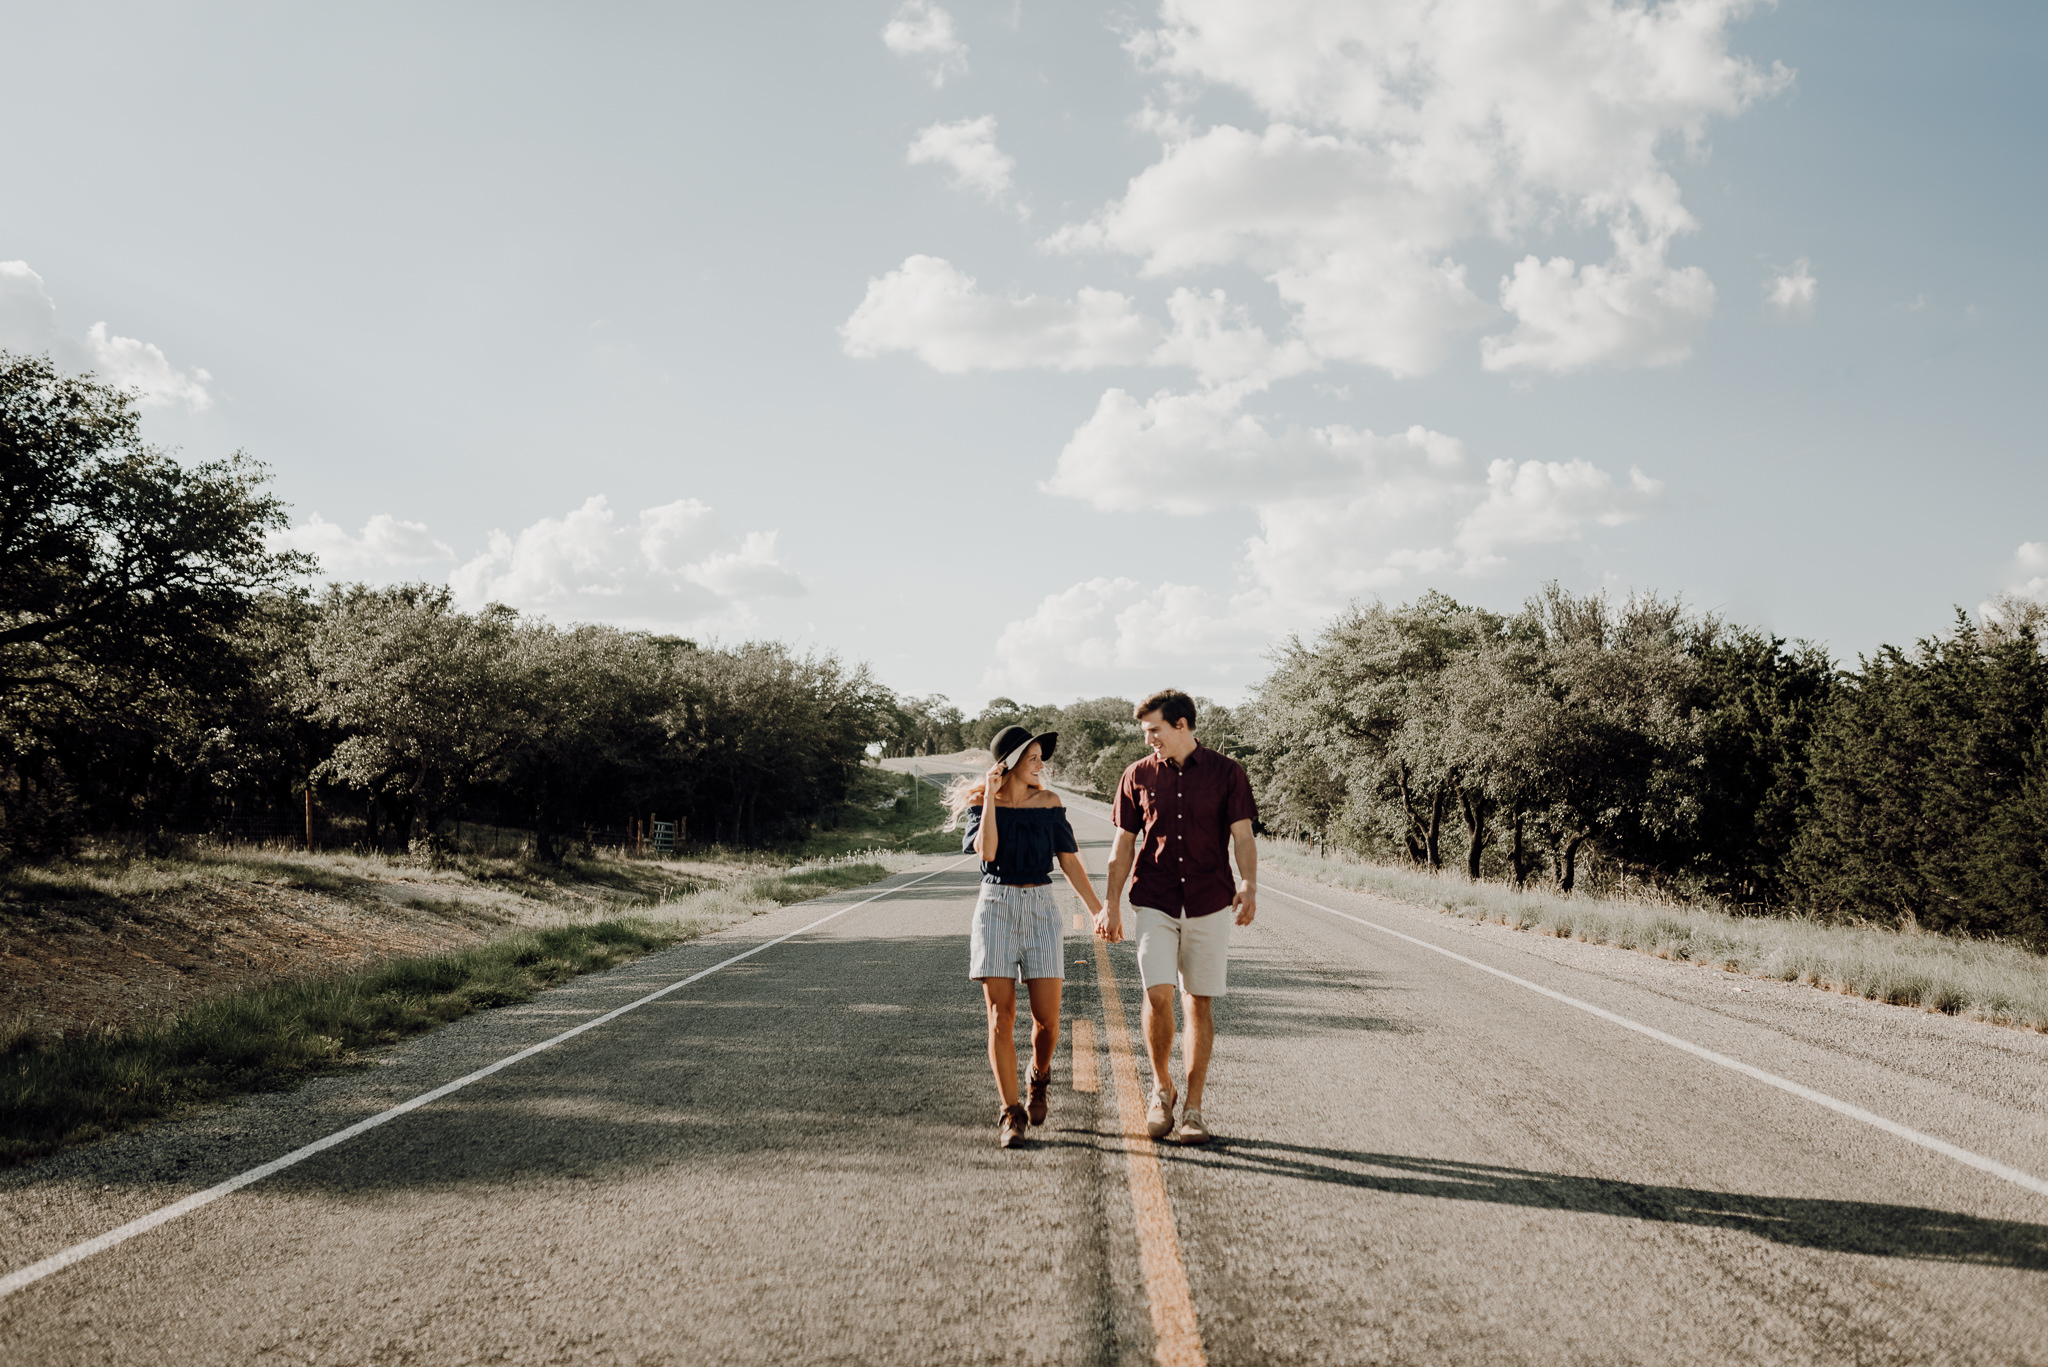 Michelle + Aron   Pederbales Falls Texas Engagement  Kristen Giles Photography - 008.jpg